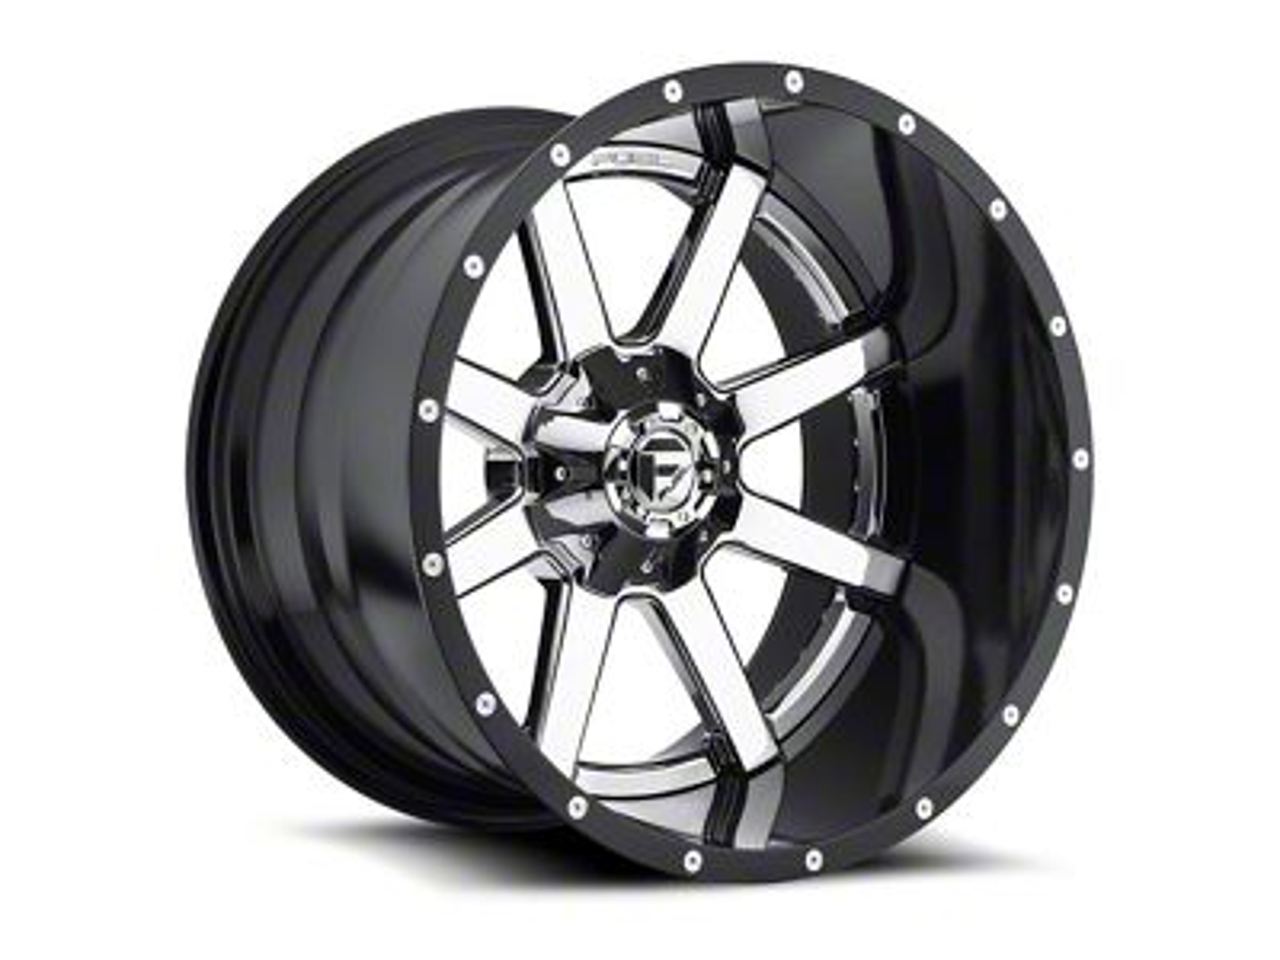 Fuel Wheels Maverick Chrome 6-Lug Wheel - 24x14 (07-18 Sierra 1500)